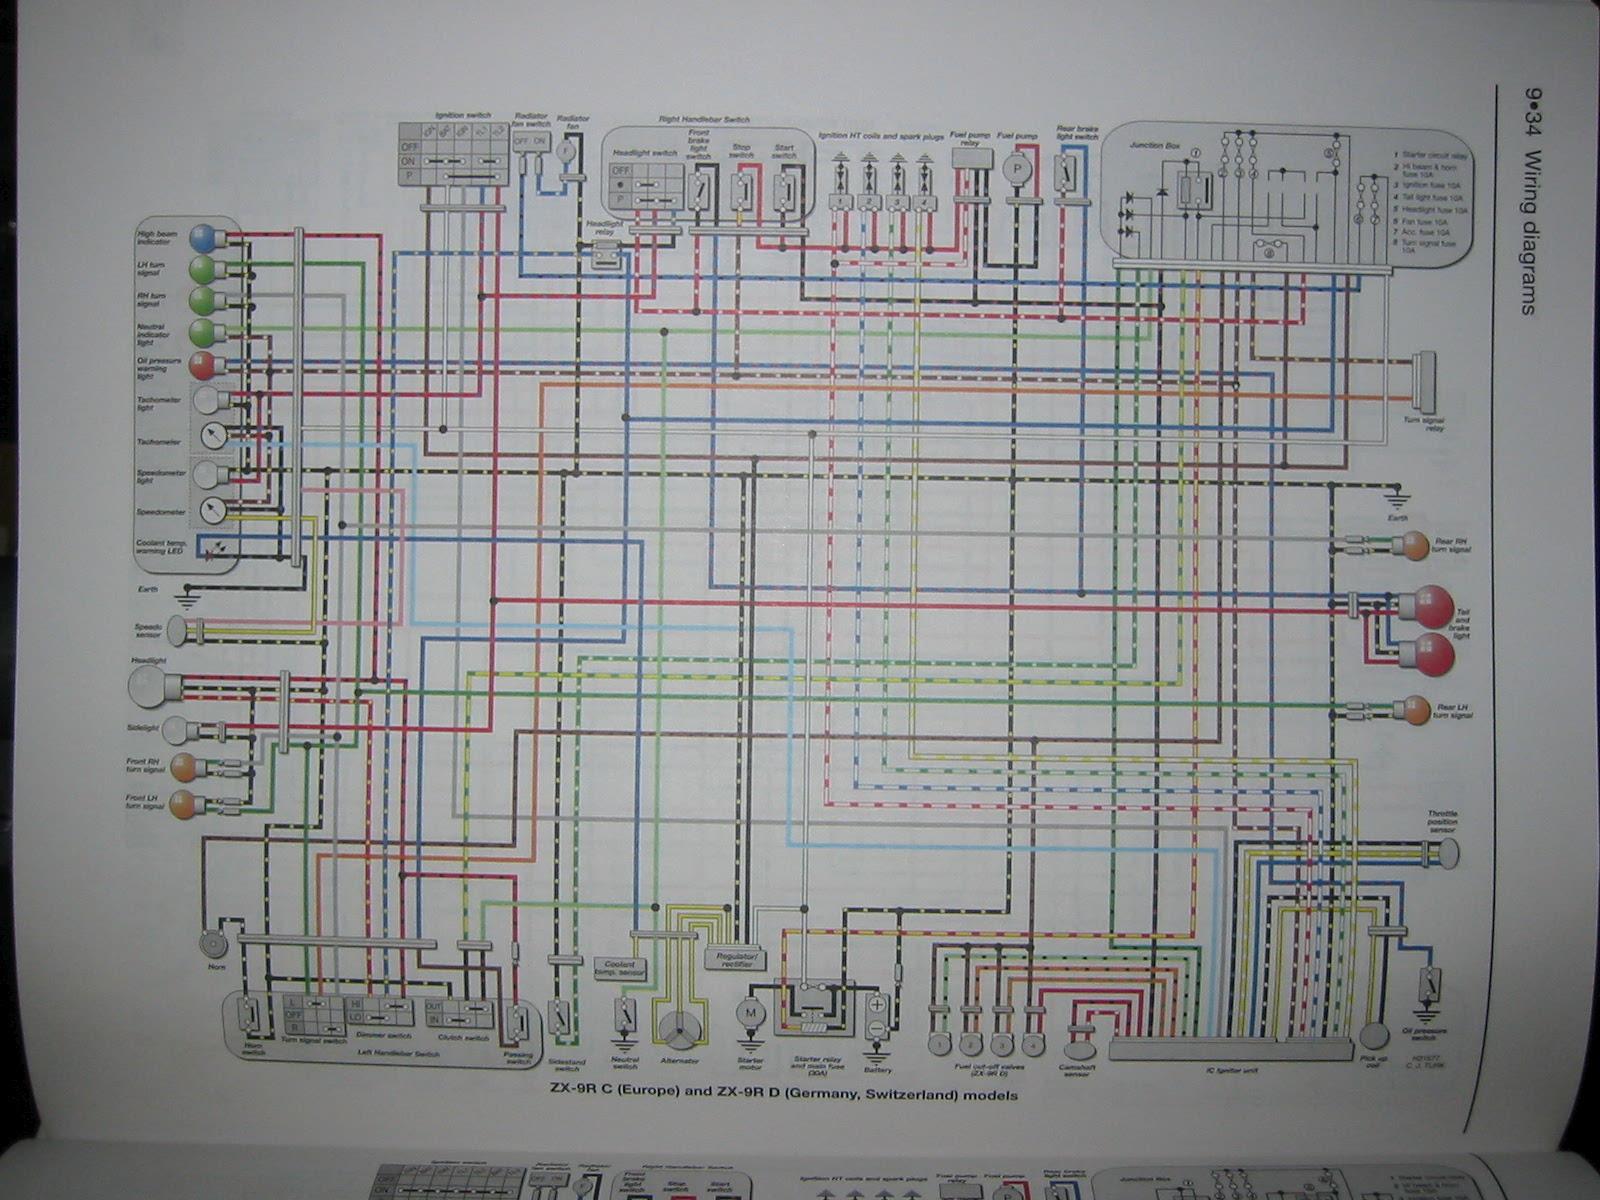 1998 Kawasaki Zx7r Wiring Diagram